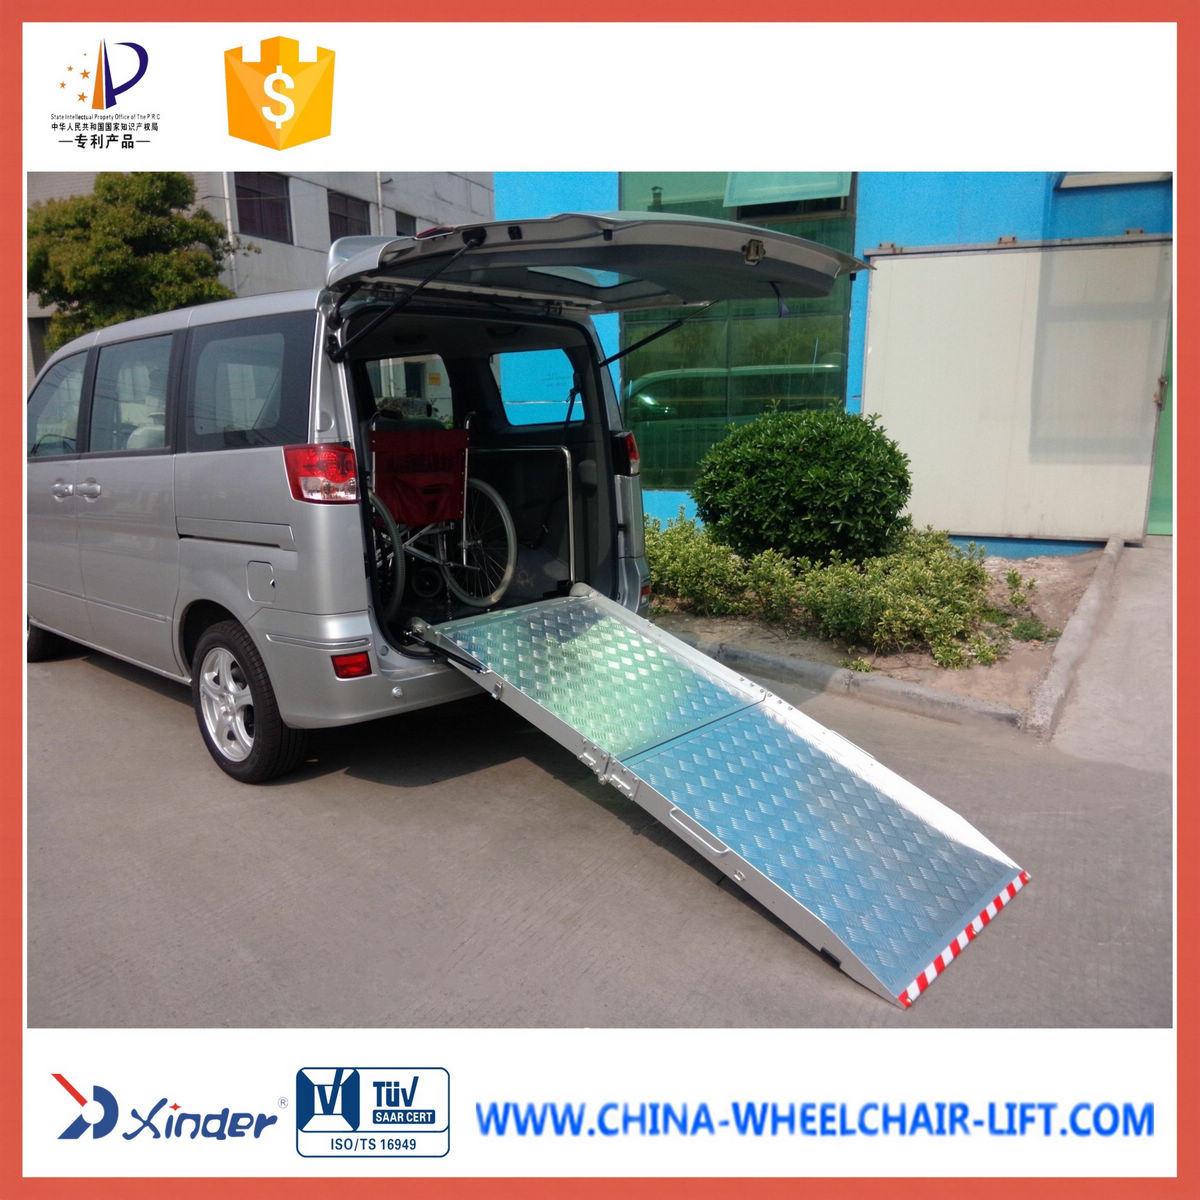 Aluminum Wheelchair Ramp for Van with Honeycom Board